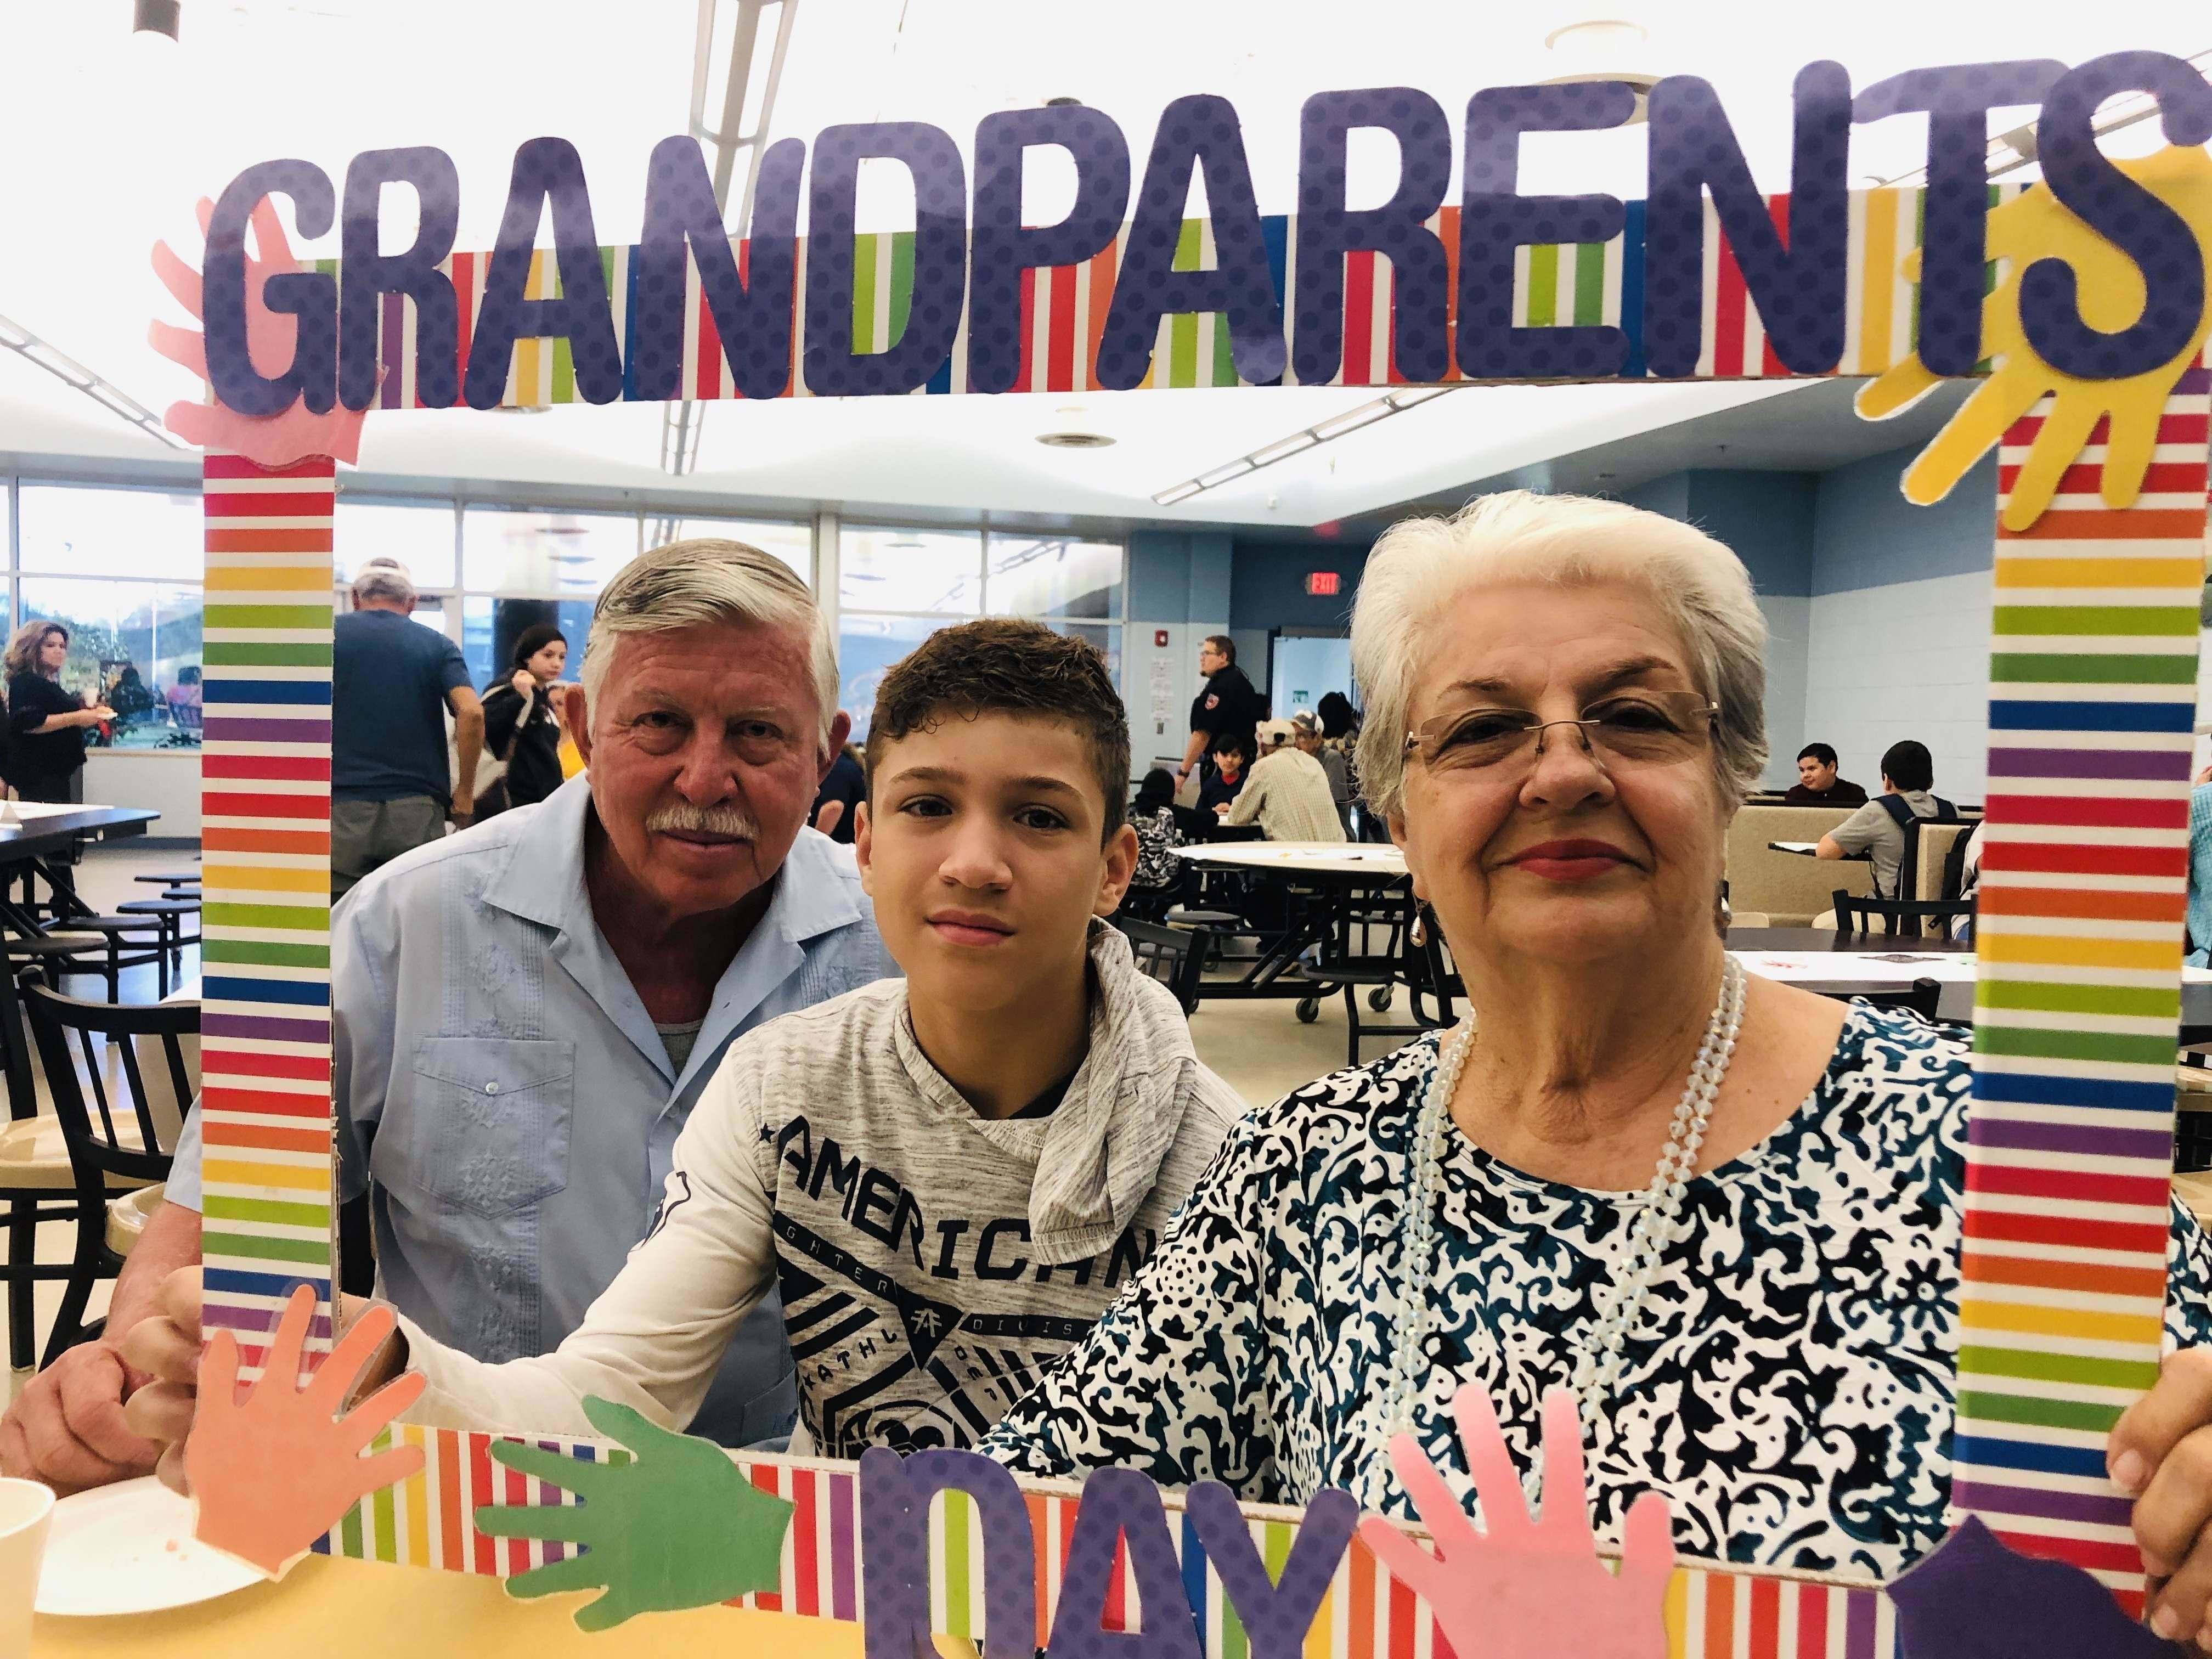 Happy Grandparent's Day!